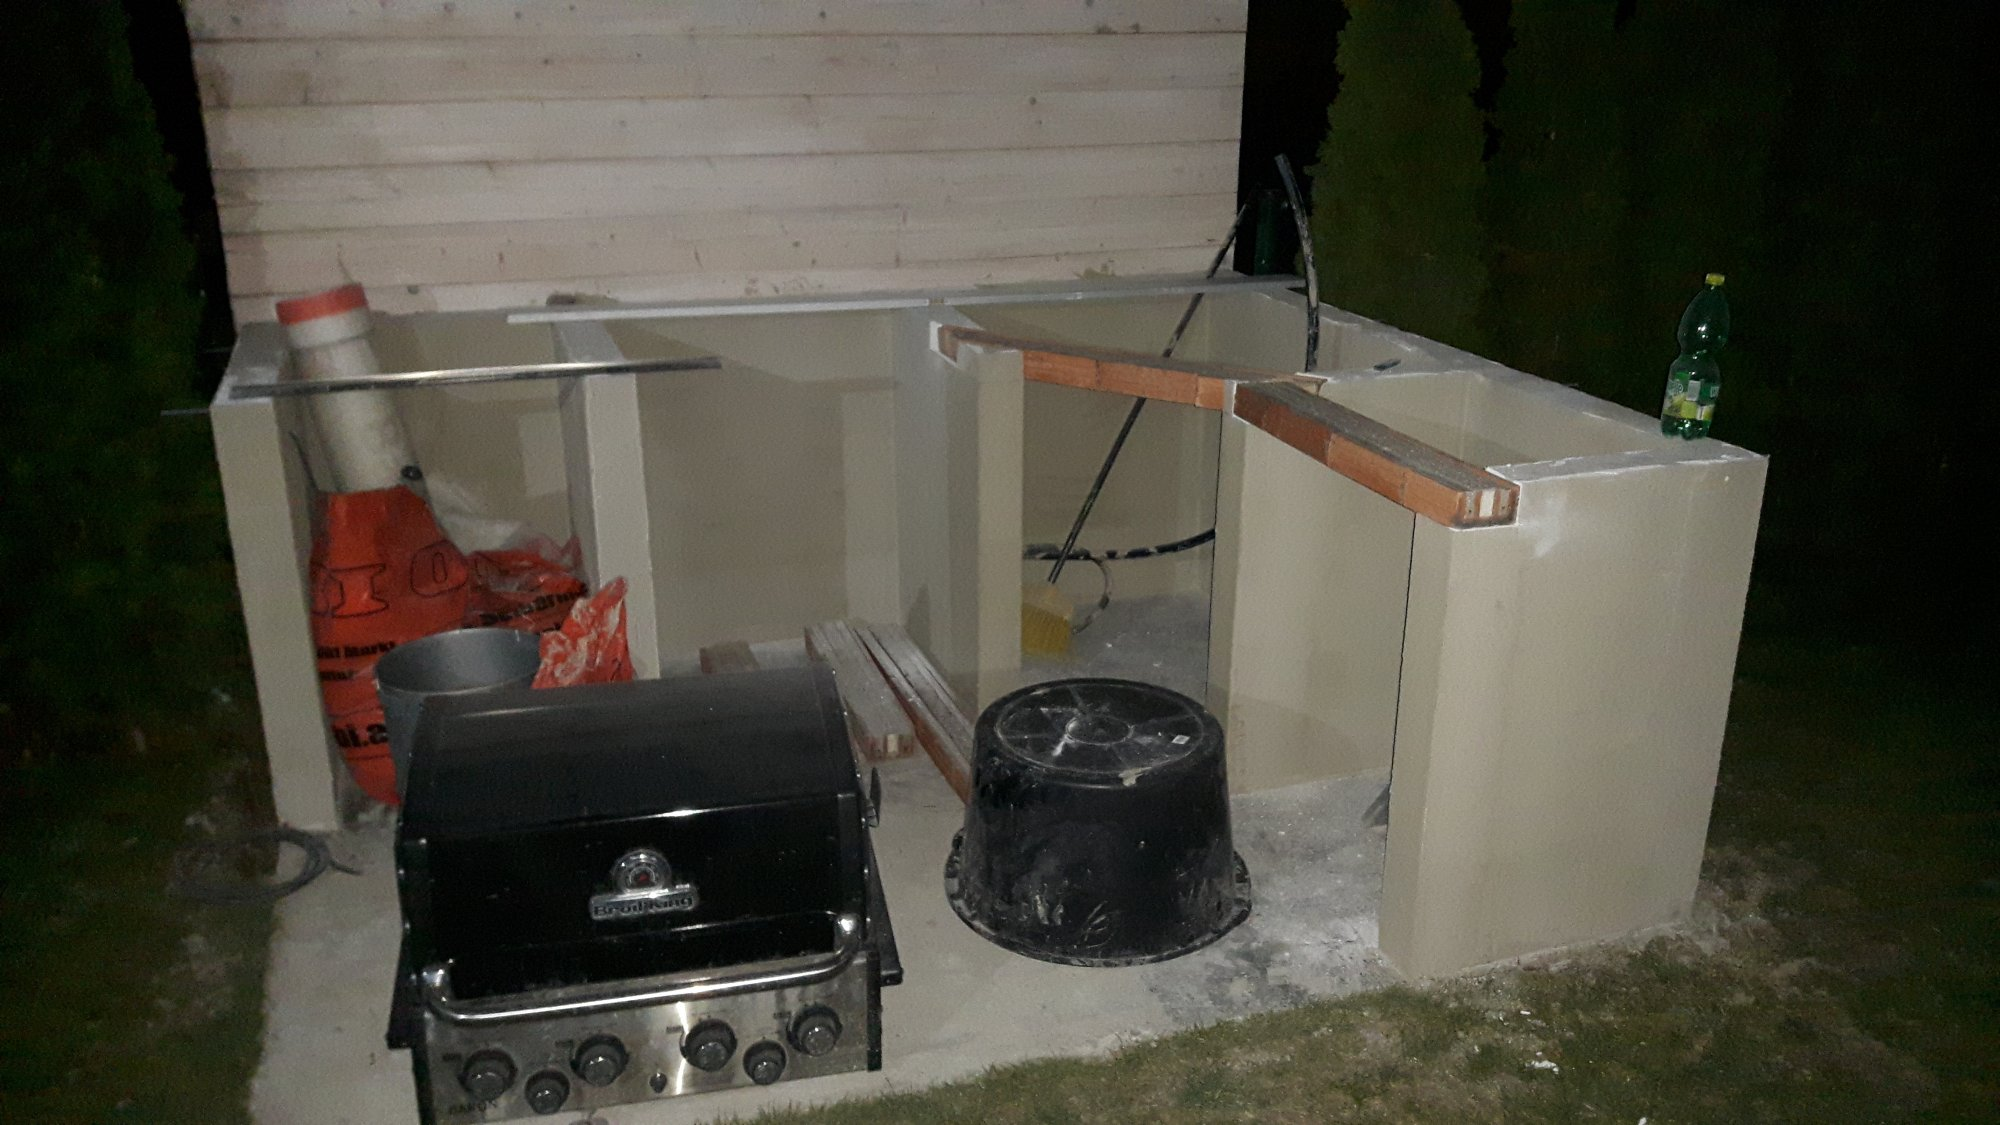 Outdoor Küche Beton Selber Bauen : Outdoor küche selber bauen beton outdoor küche aus porenbeton